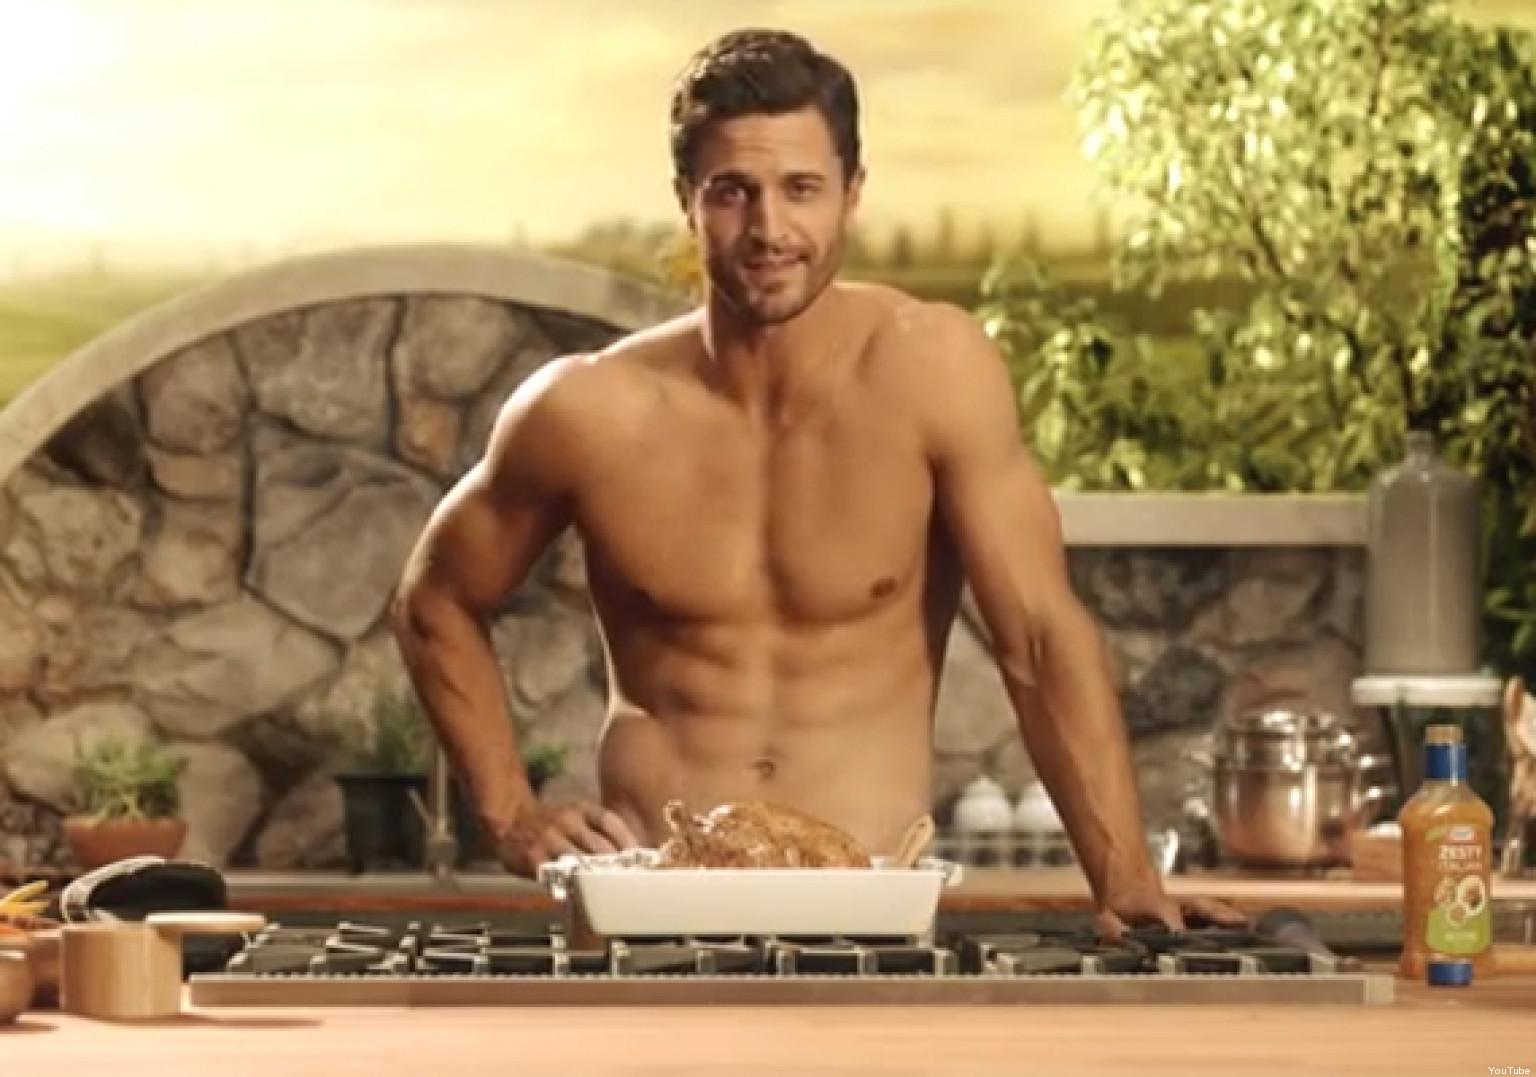 Sarah anuncios desnudos fotos